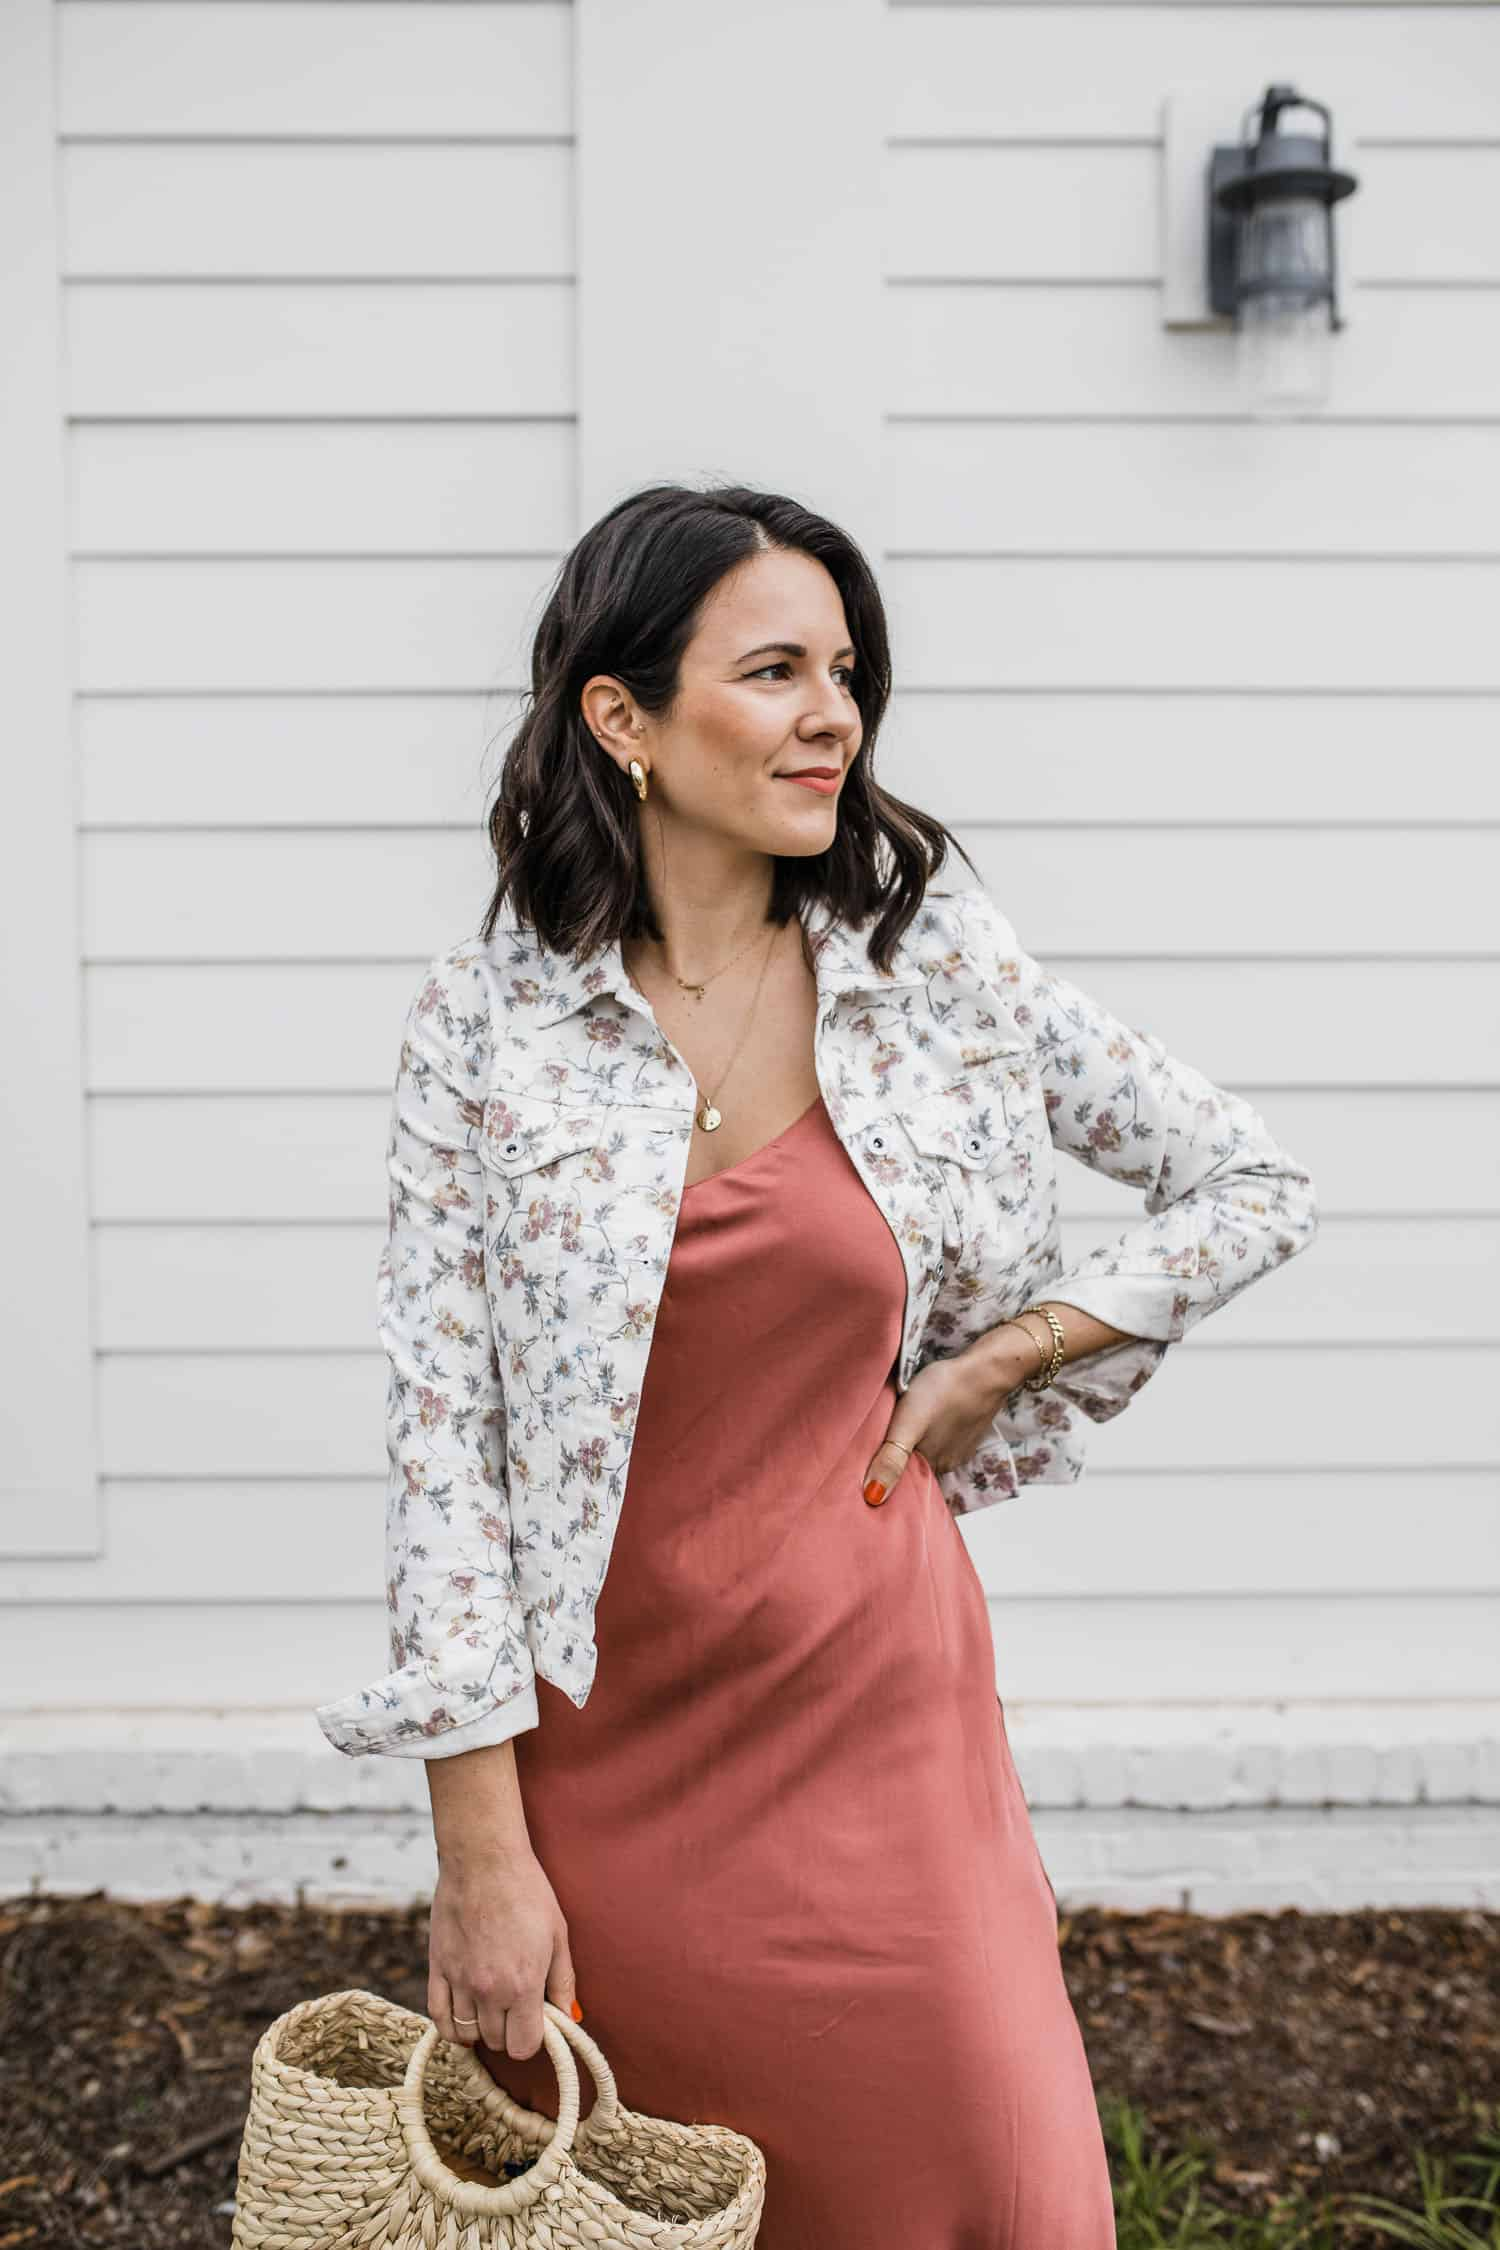 Jessica Camerata of My Style Vita in a floral denim jacket